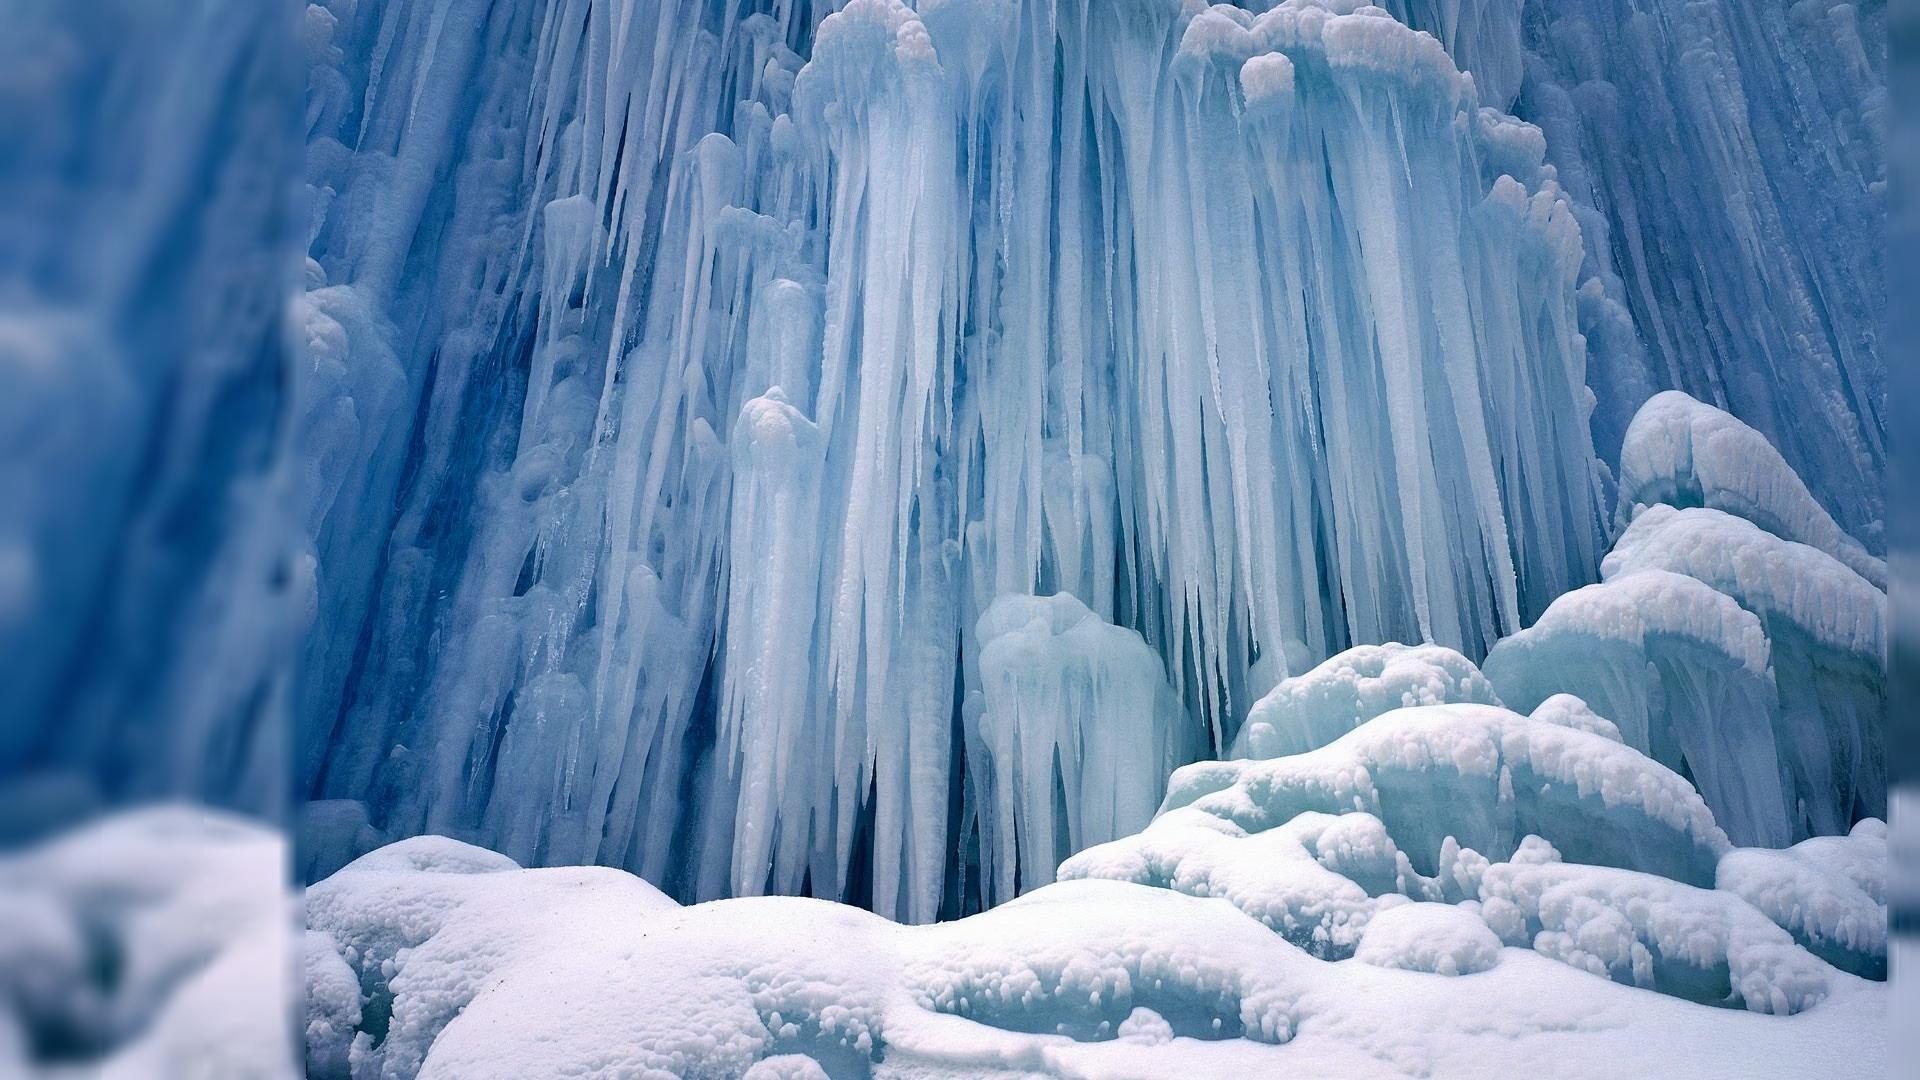 5. free-winter-desktop-wallpapers-backgrounds5-600×338